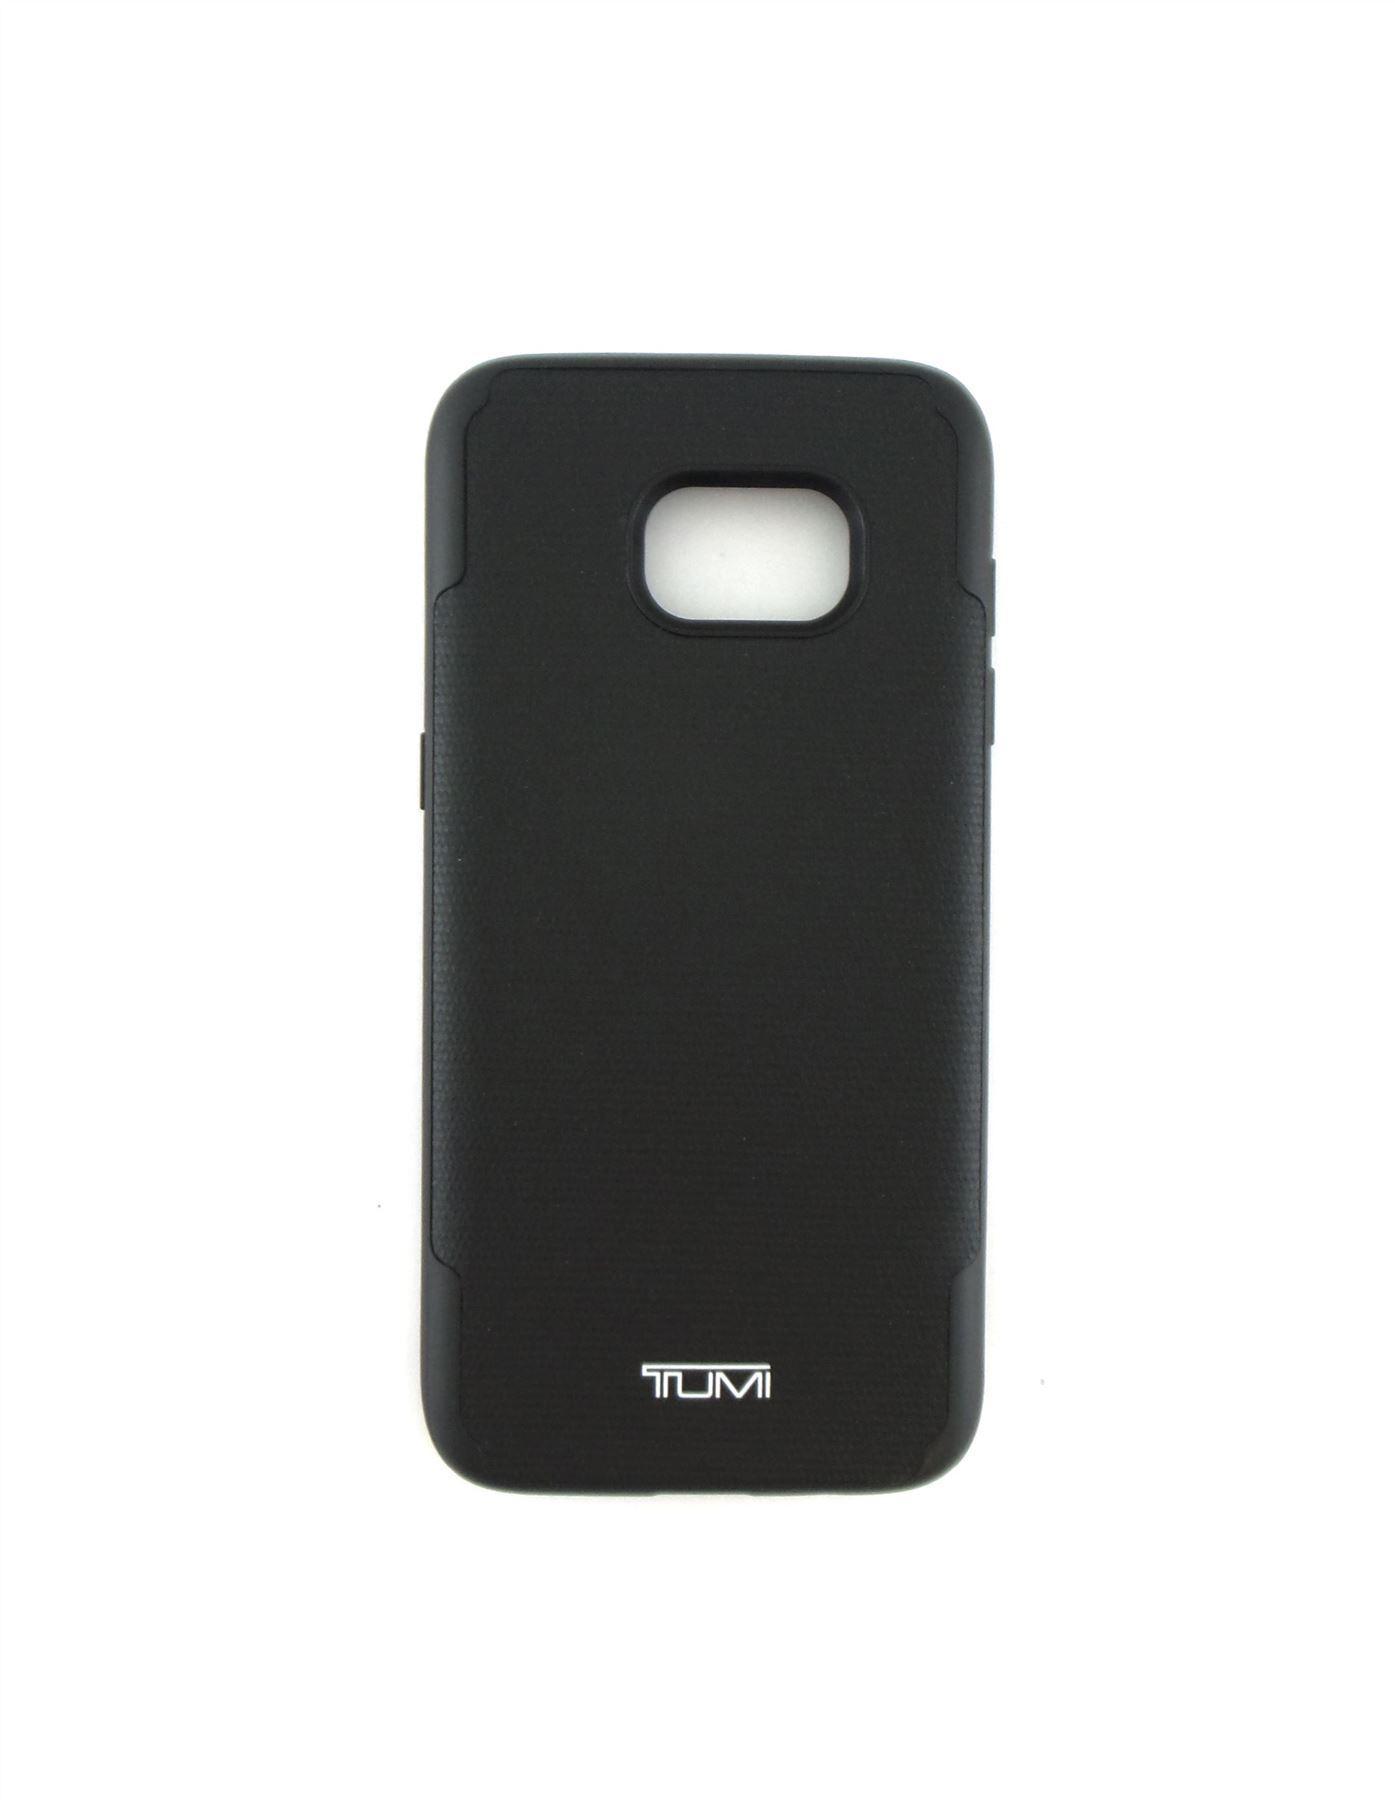 Tumi Coated Canvas Co Mold Case For Samsung Galaxy S7 Edge Black Goospery A5 2016 Diary Gray